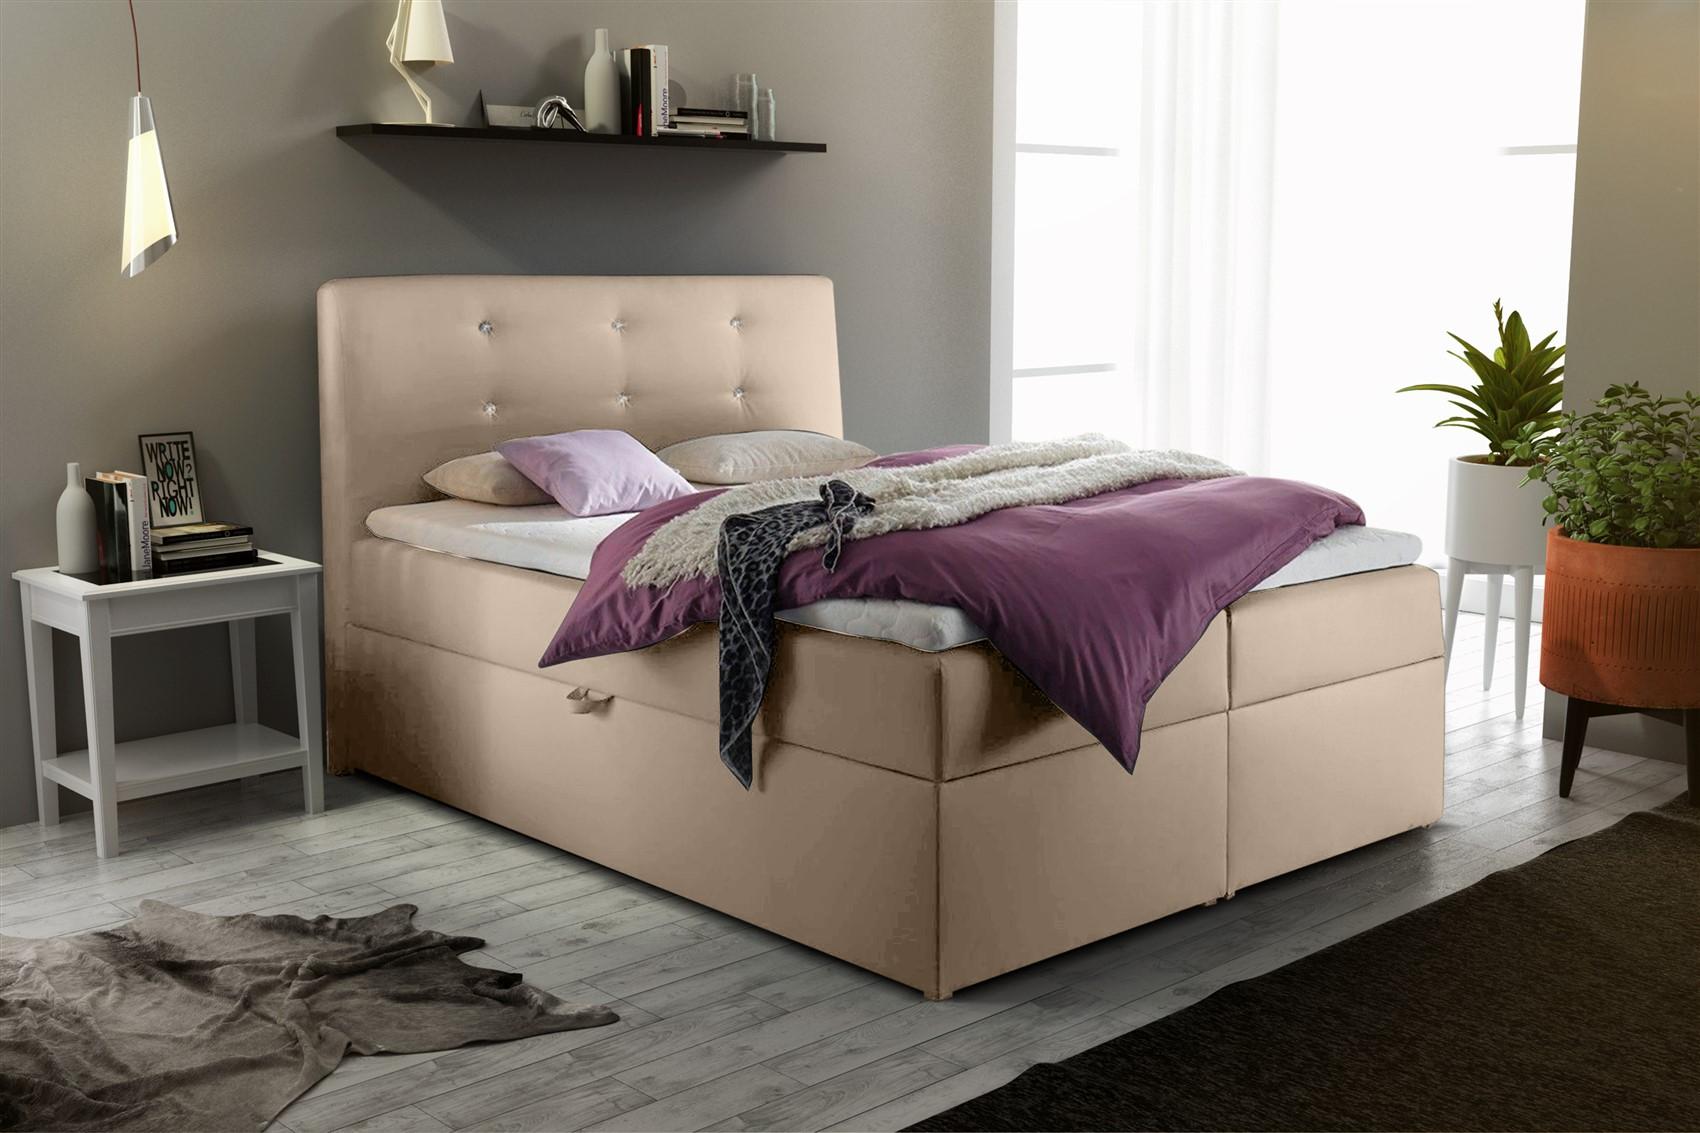 boxspringbett schlafzimmerbett monza kunstleder creme 140x200 cm fun m bel. Black Bedroom Furniture Sets. Home Design Ideas